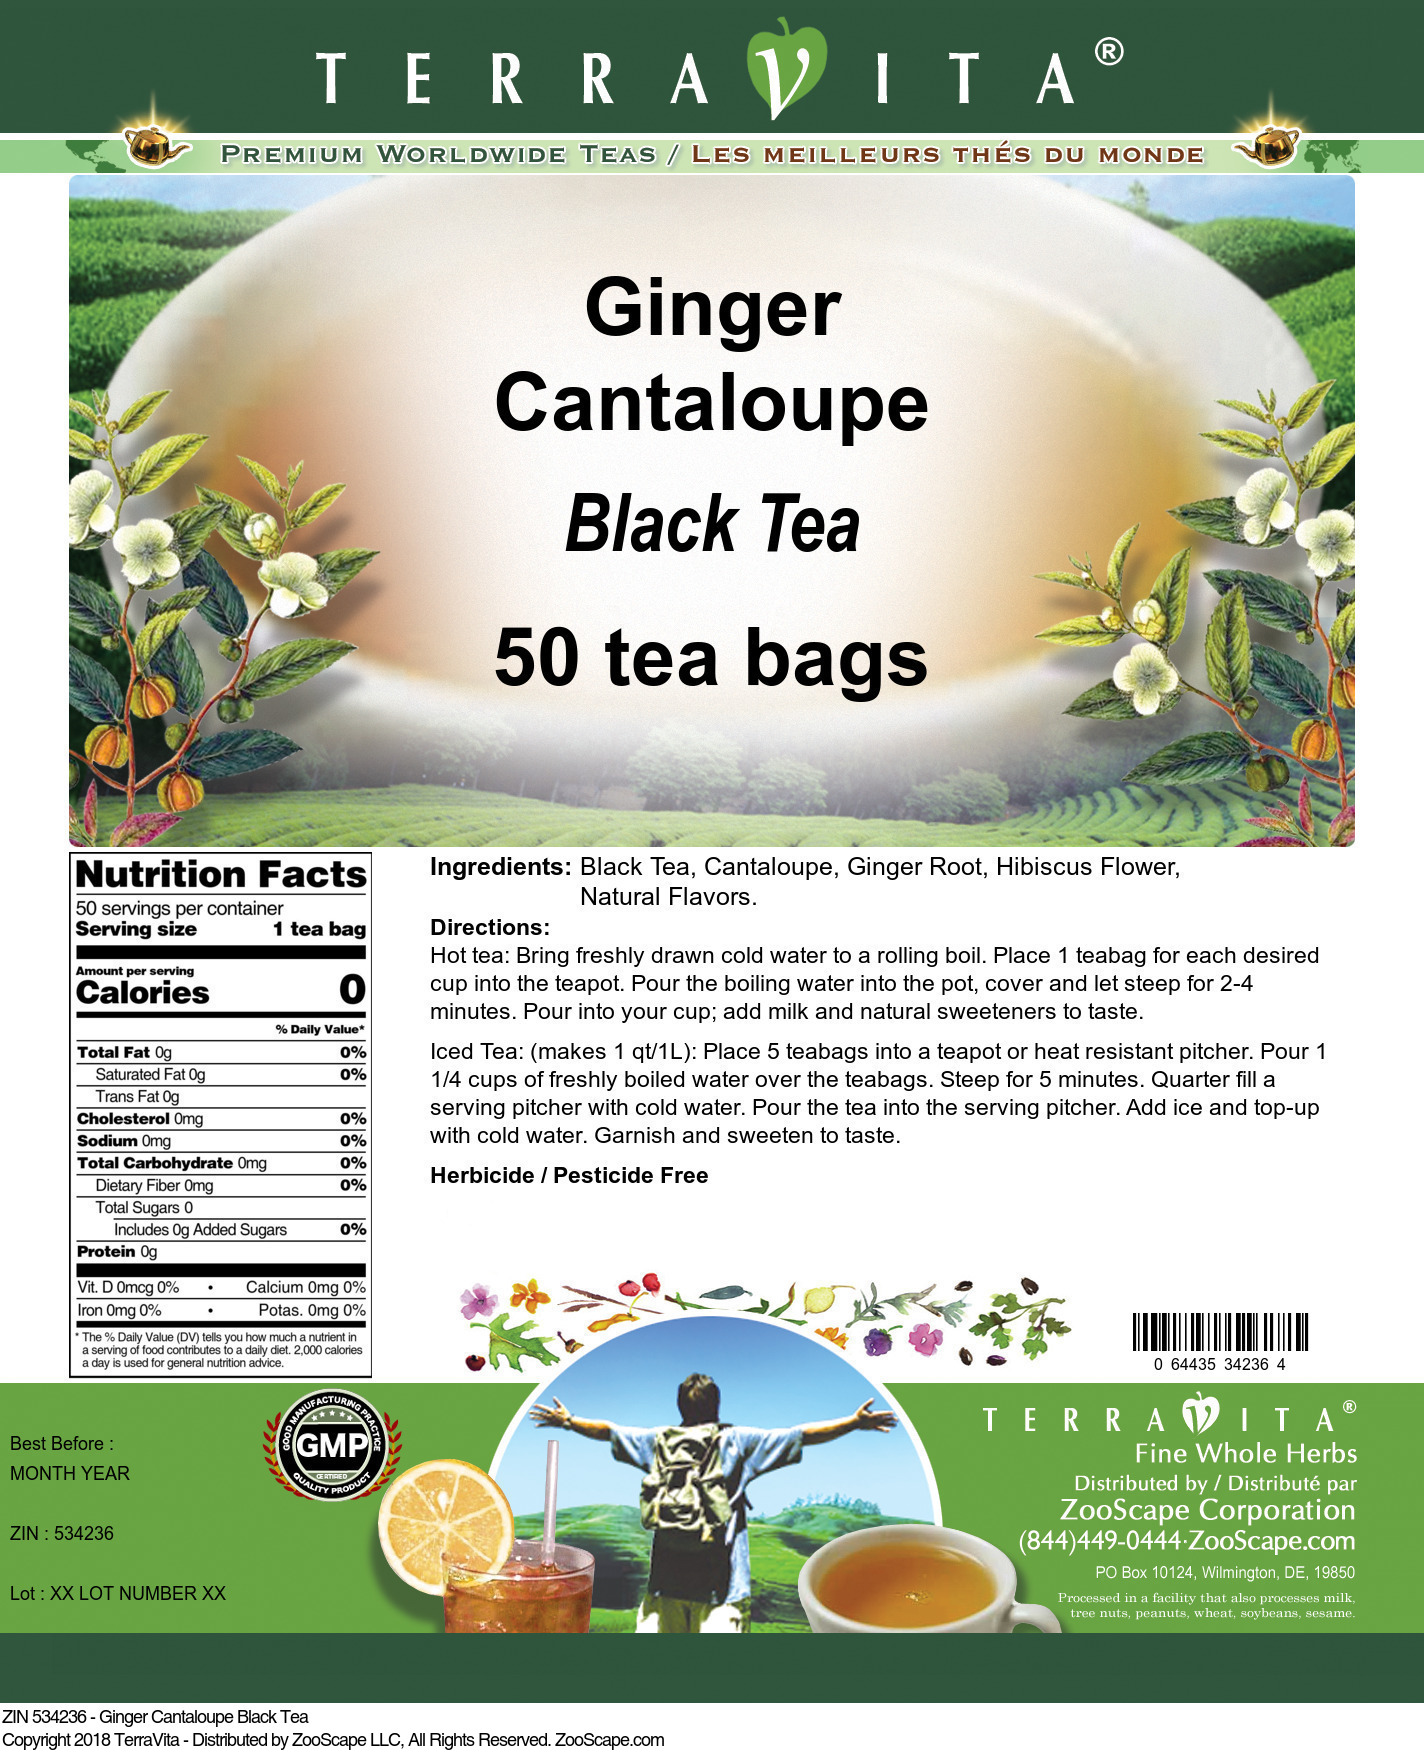 Ginger Cantaloupe Black Tea